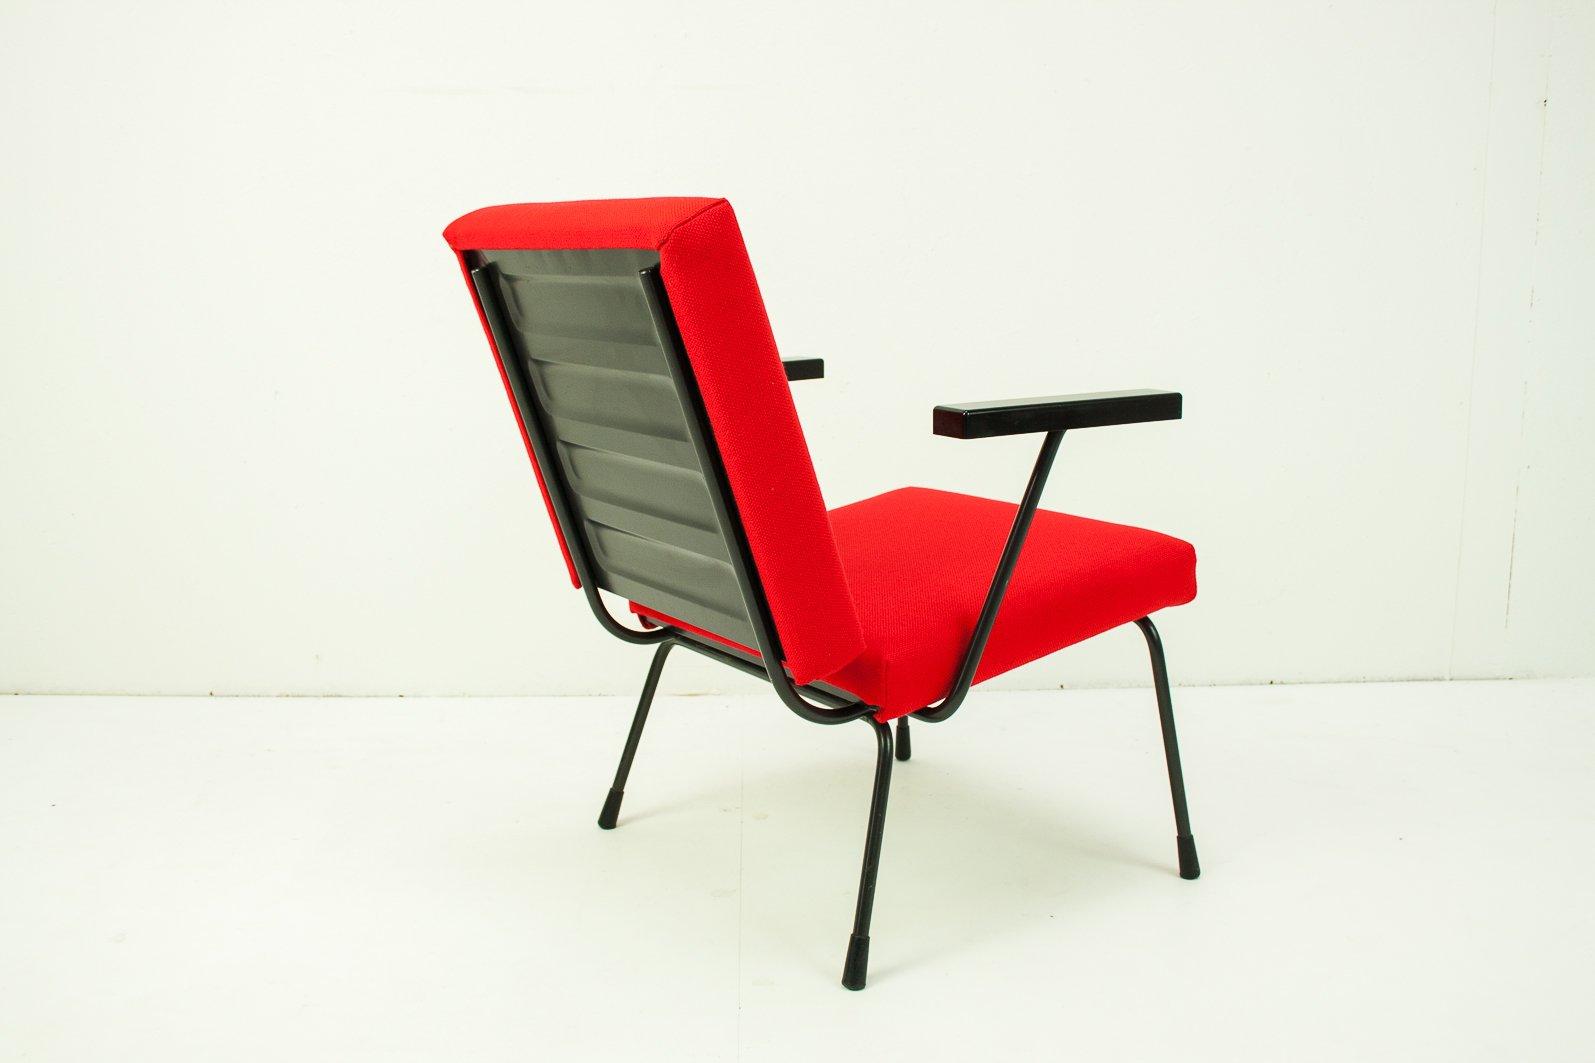 415 1401 stuhl von wim rietveld f r gispen 1950er bei. Black Bedroom Furniture Sets. Home Design Ideas